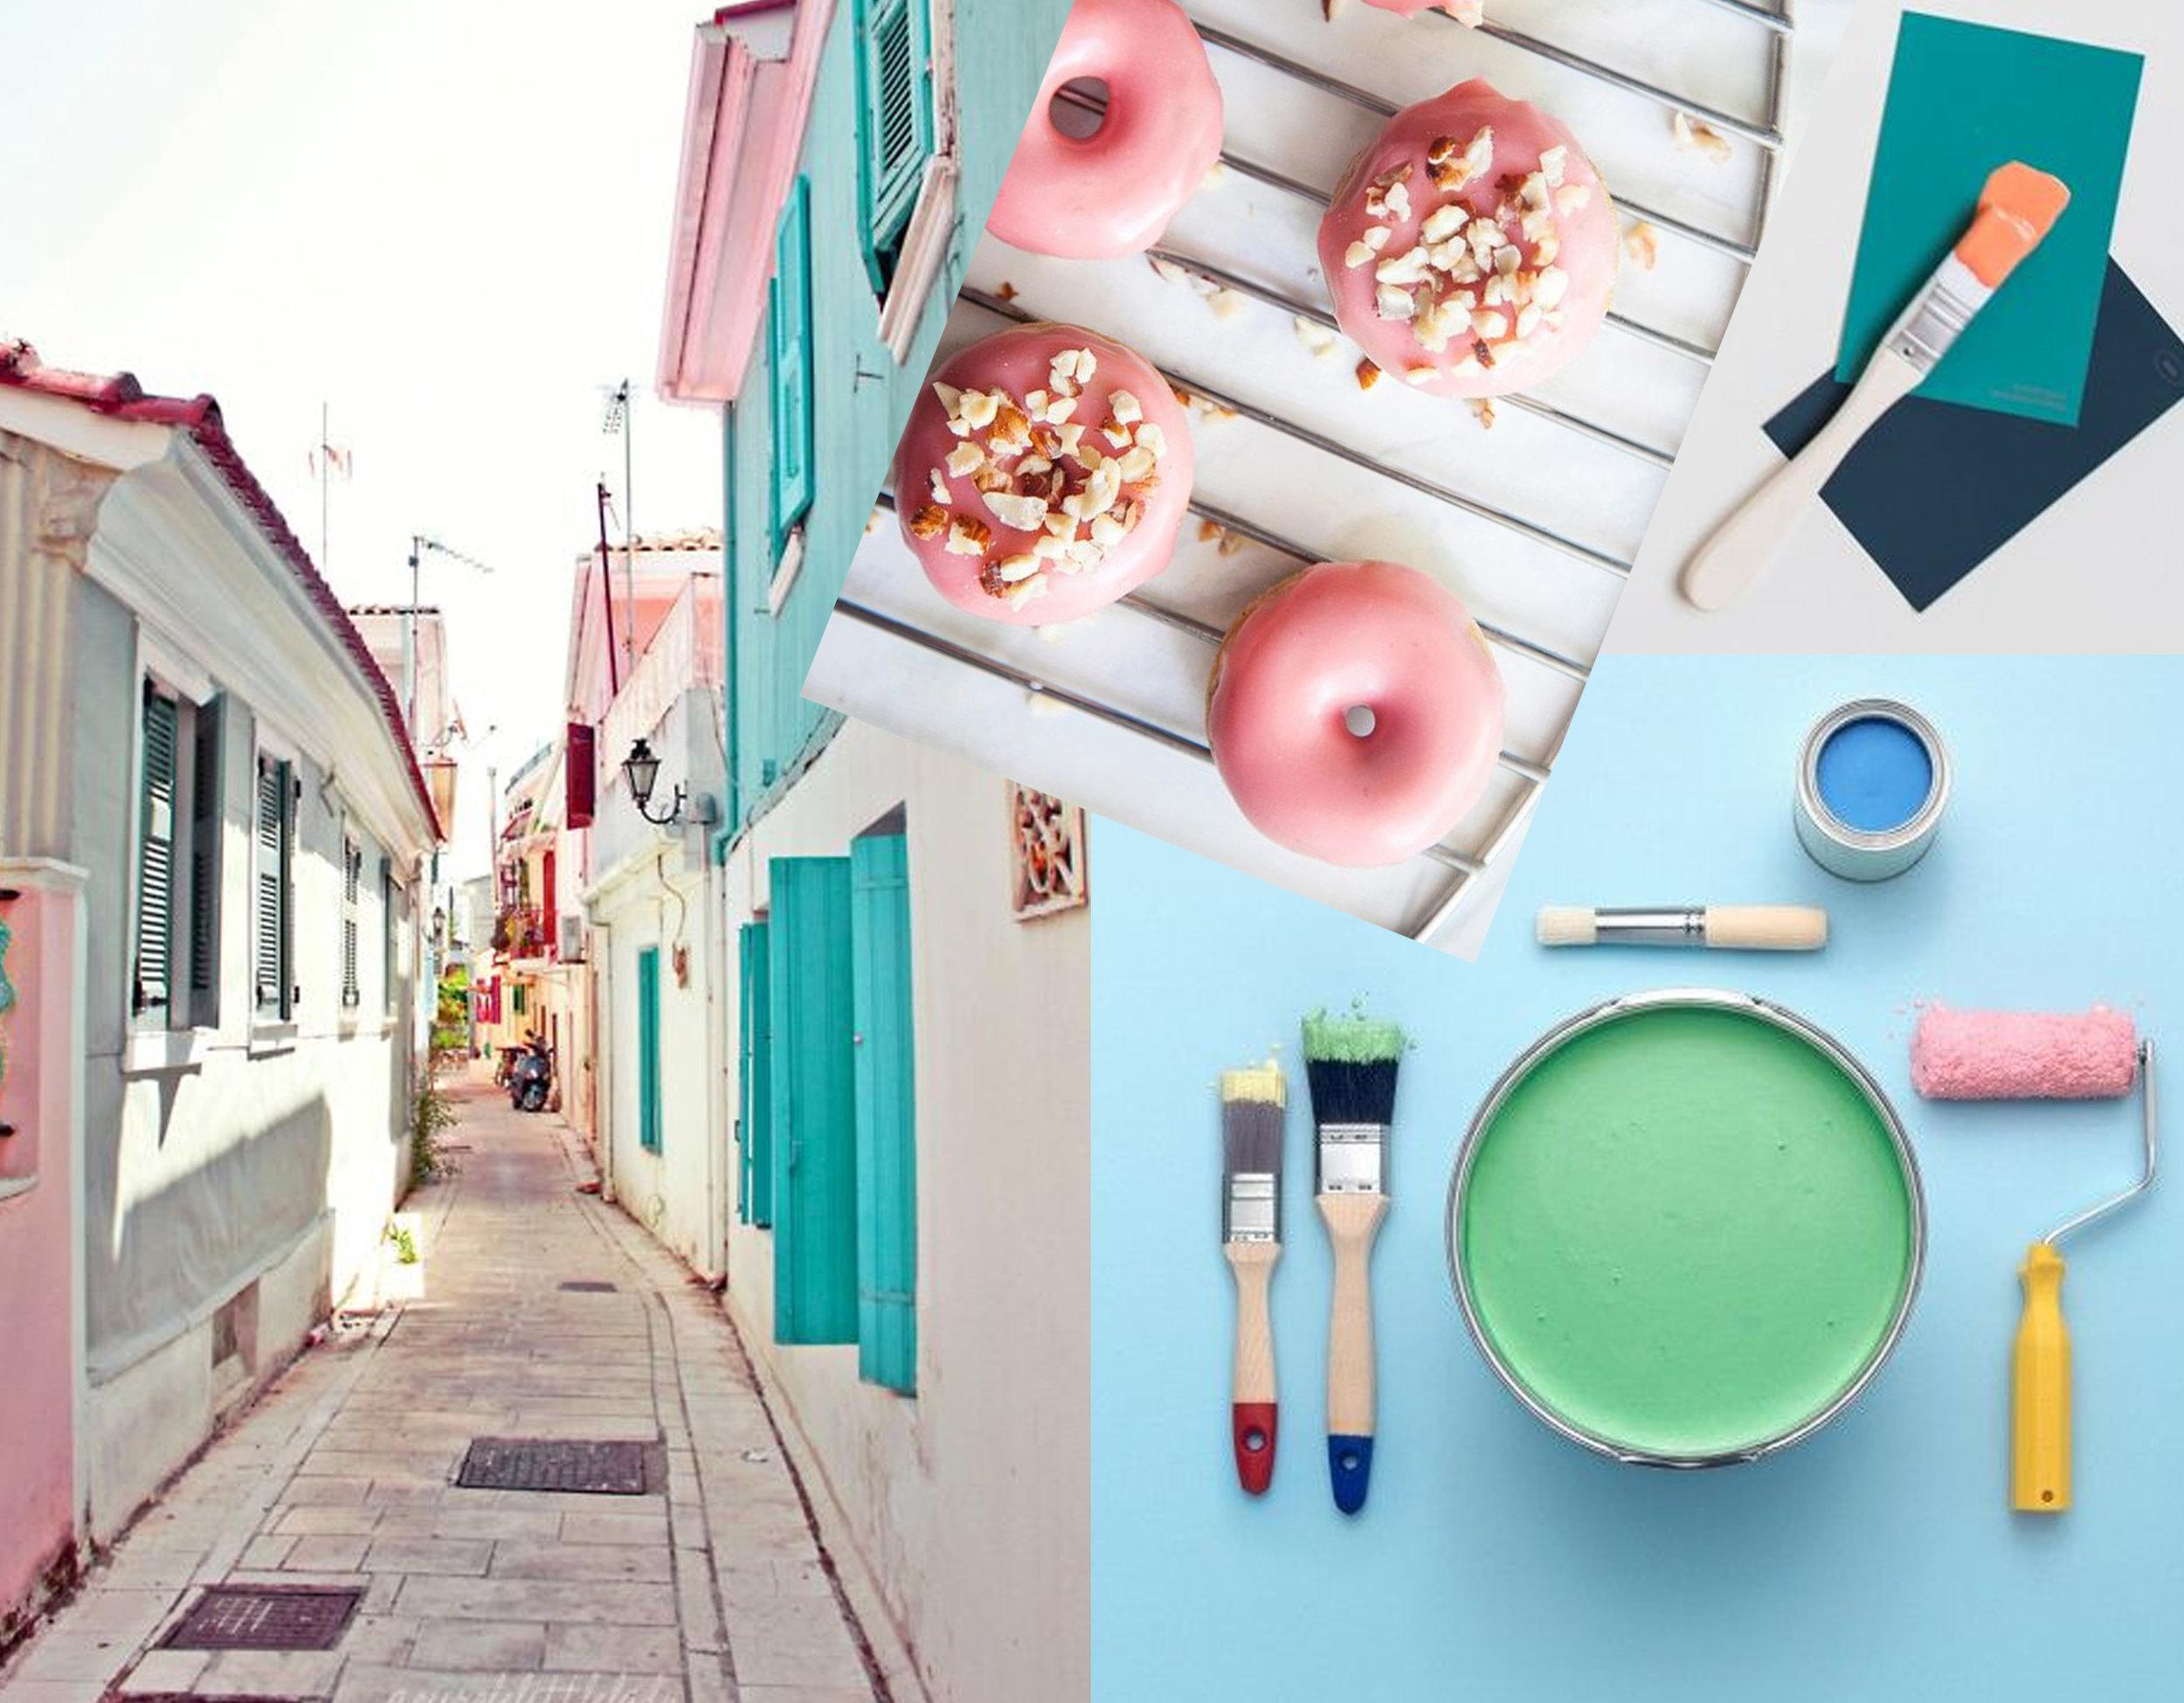 image Greece via  Pinterest  - doughnuts via  Made By Girl  - paint colors via  Pinterest